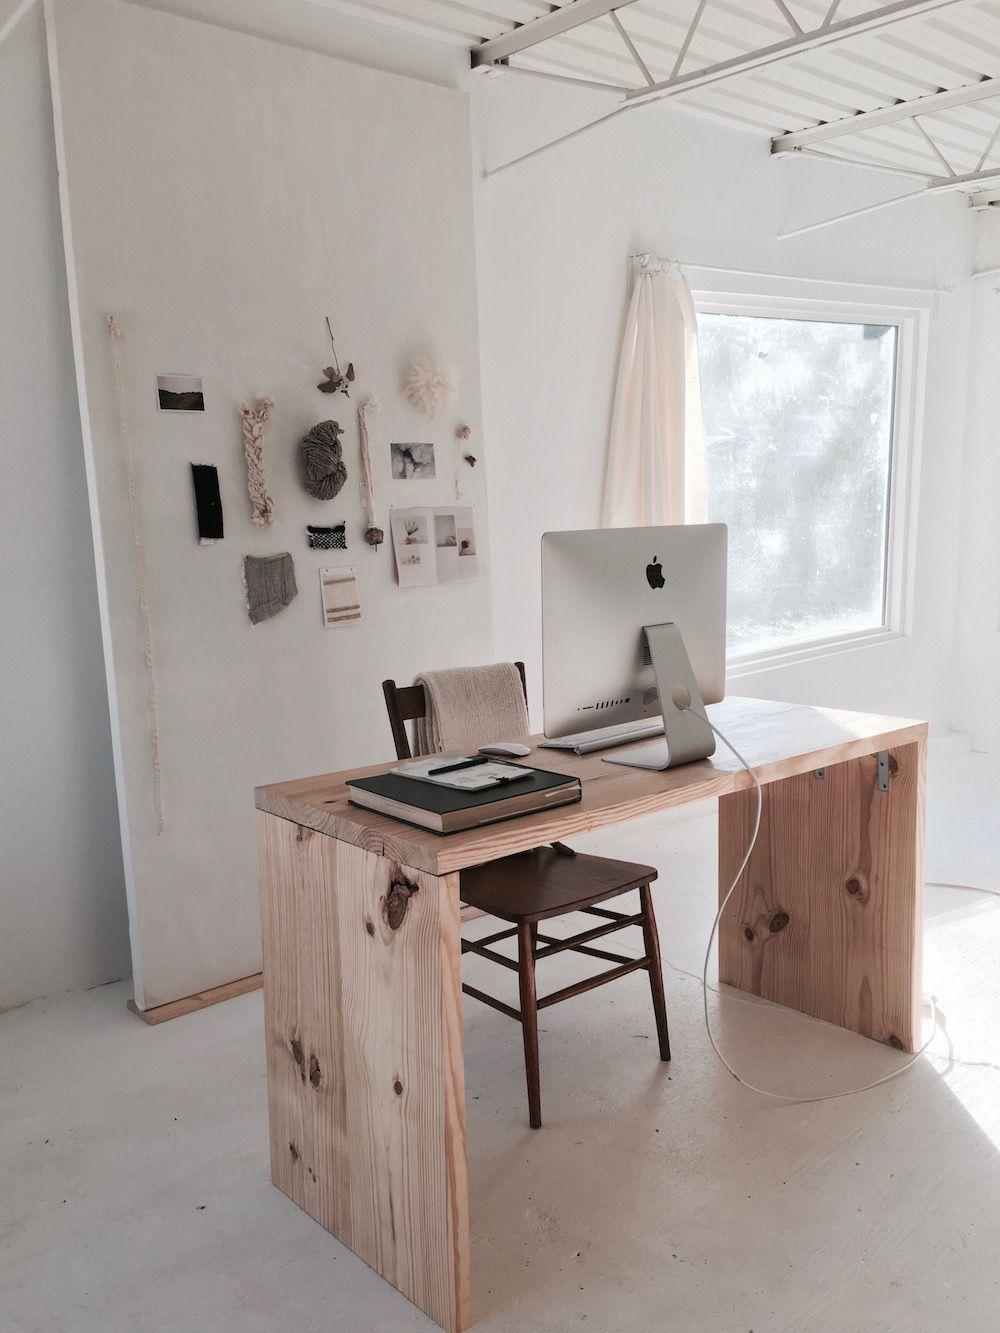 bureau minimaliste en bois brut inside han starnes s dreamily minimalist nashville studio of a kind